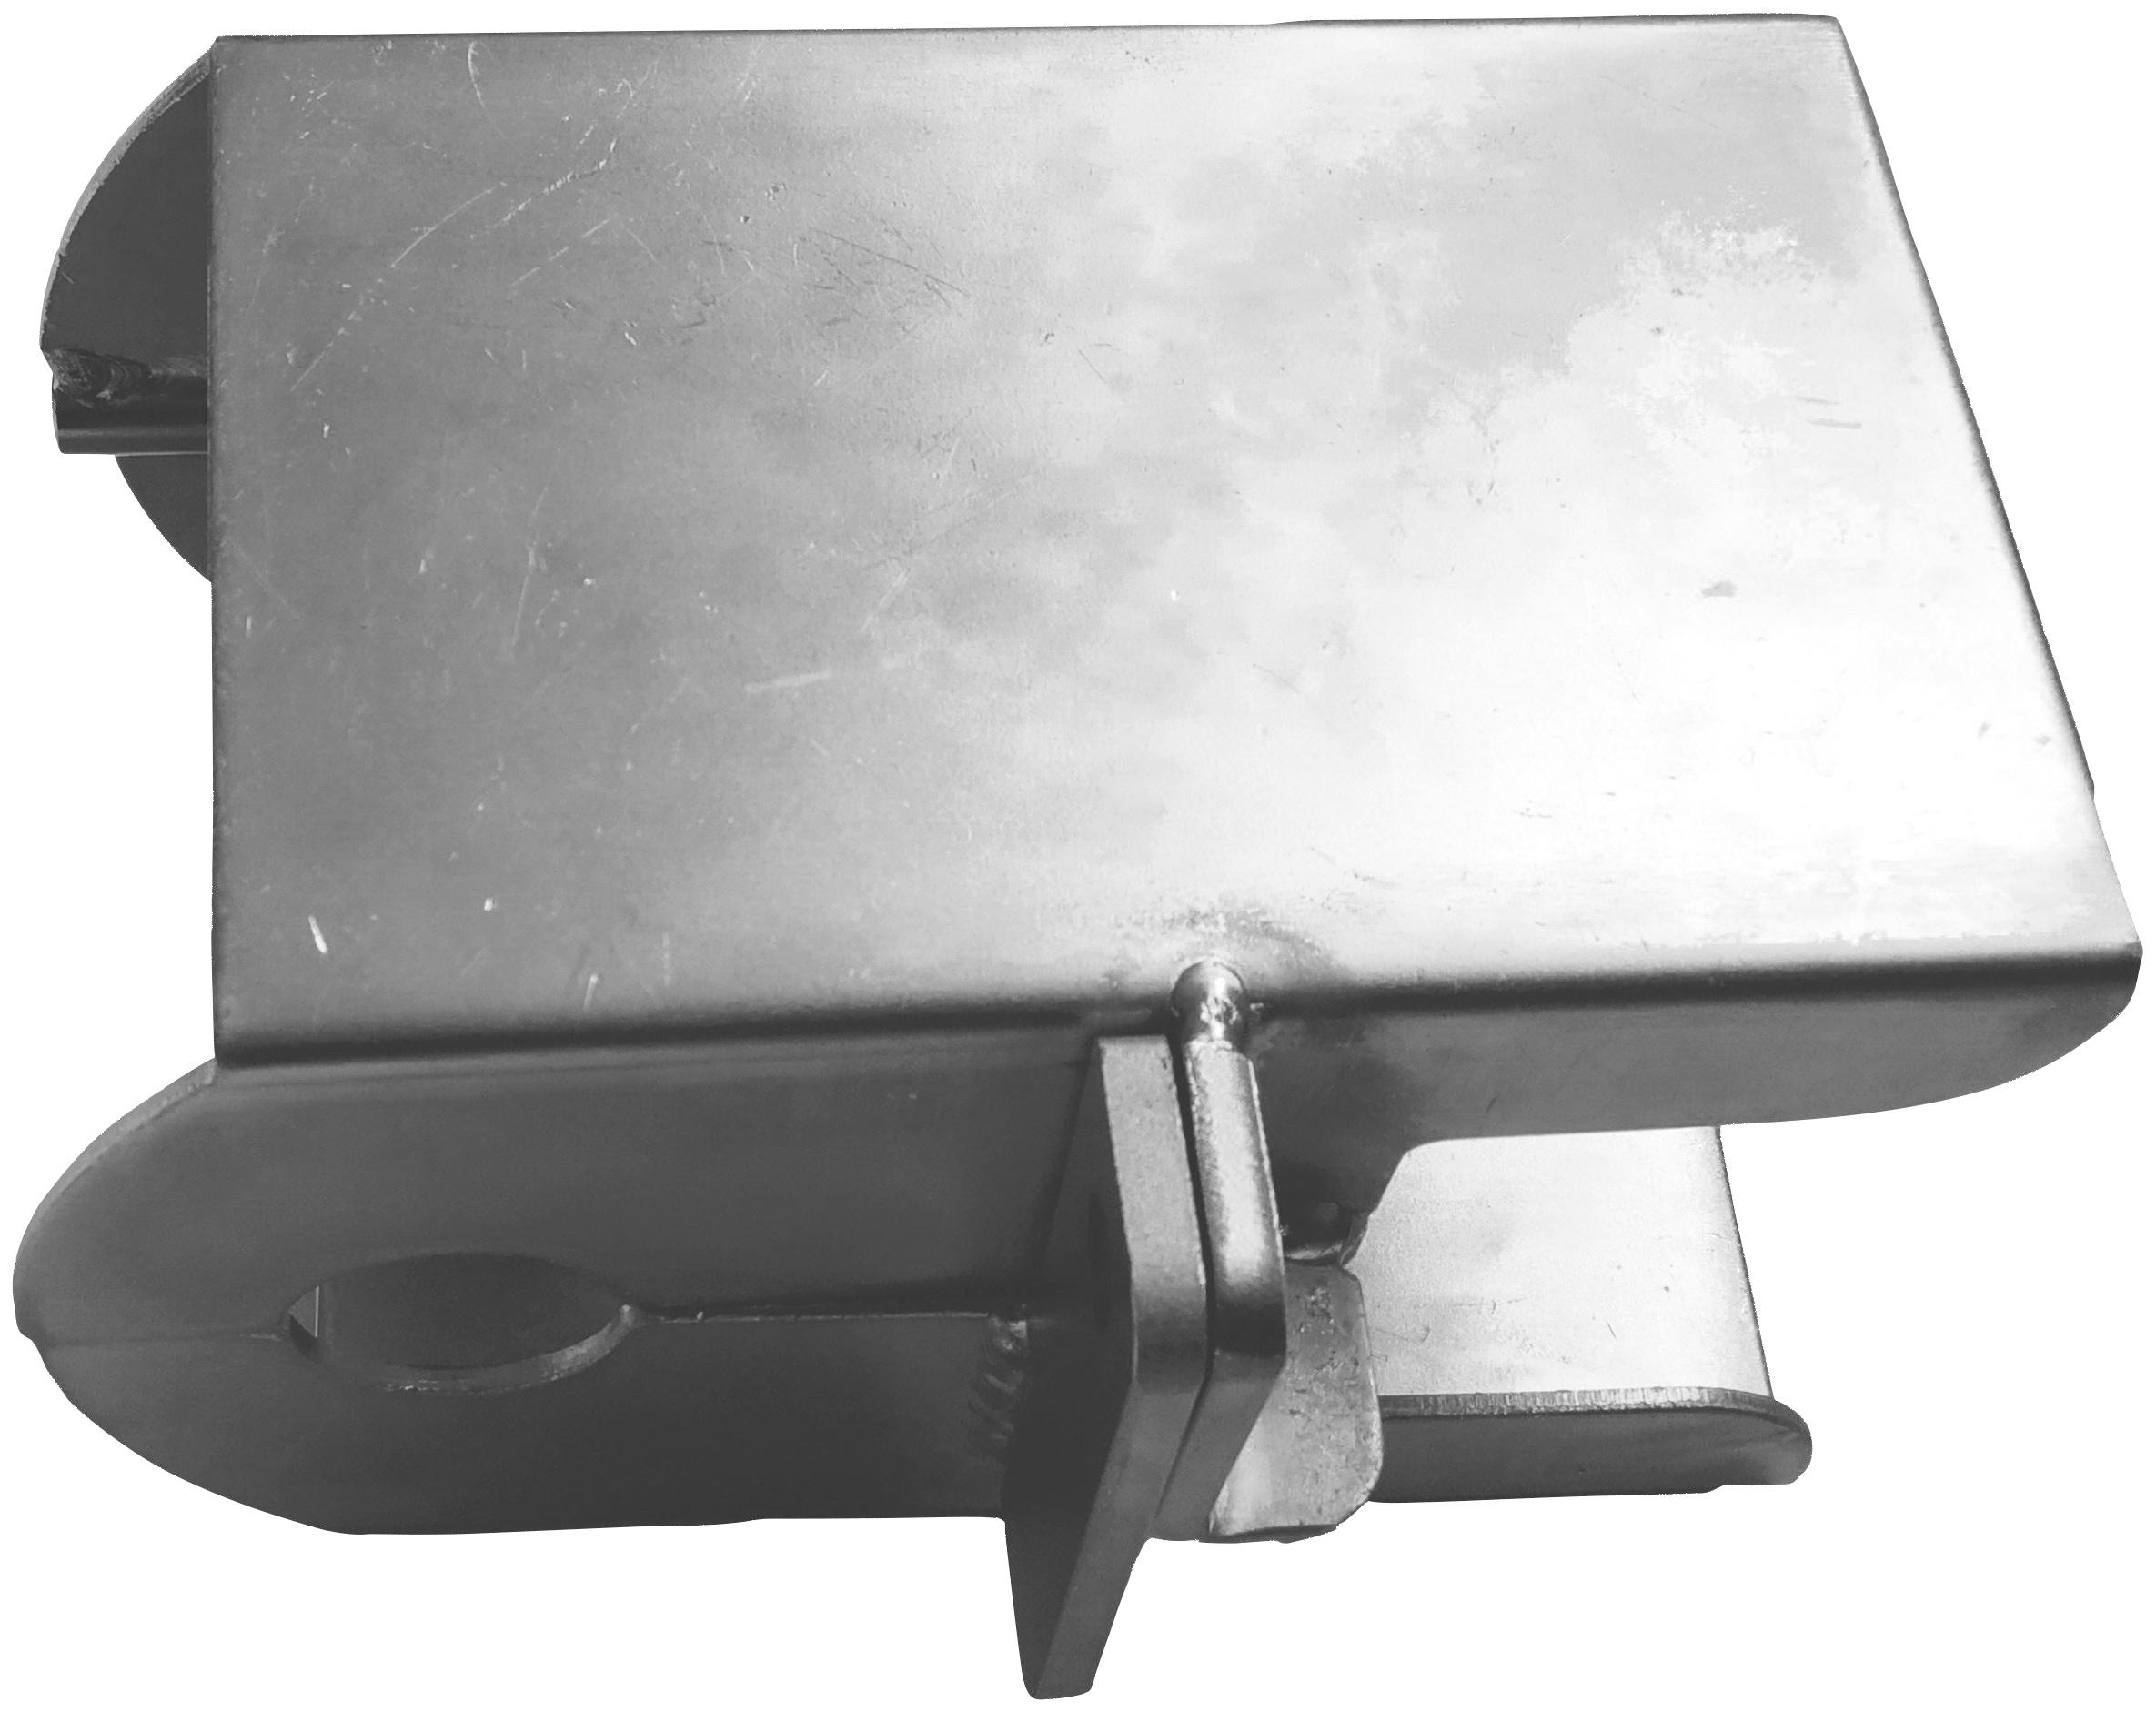 BASI Anhängerschloss silberfarben Autoanhänger Autozubehör Reifen